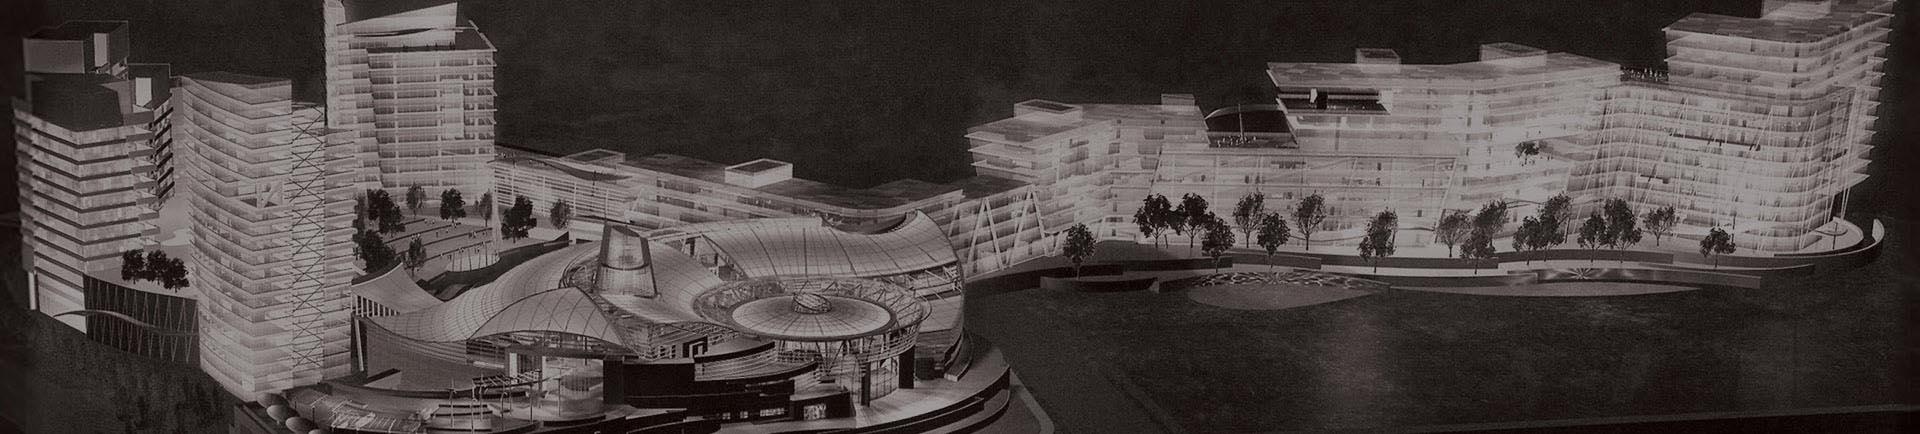 urban-design-master-planning-header